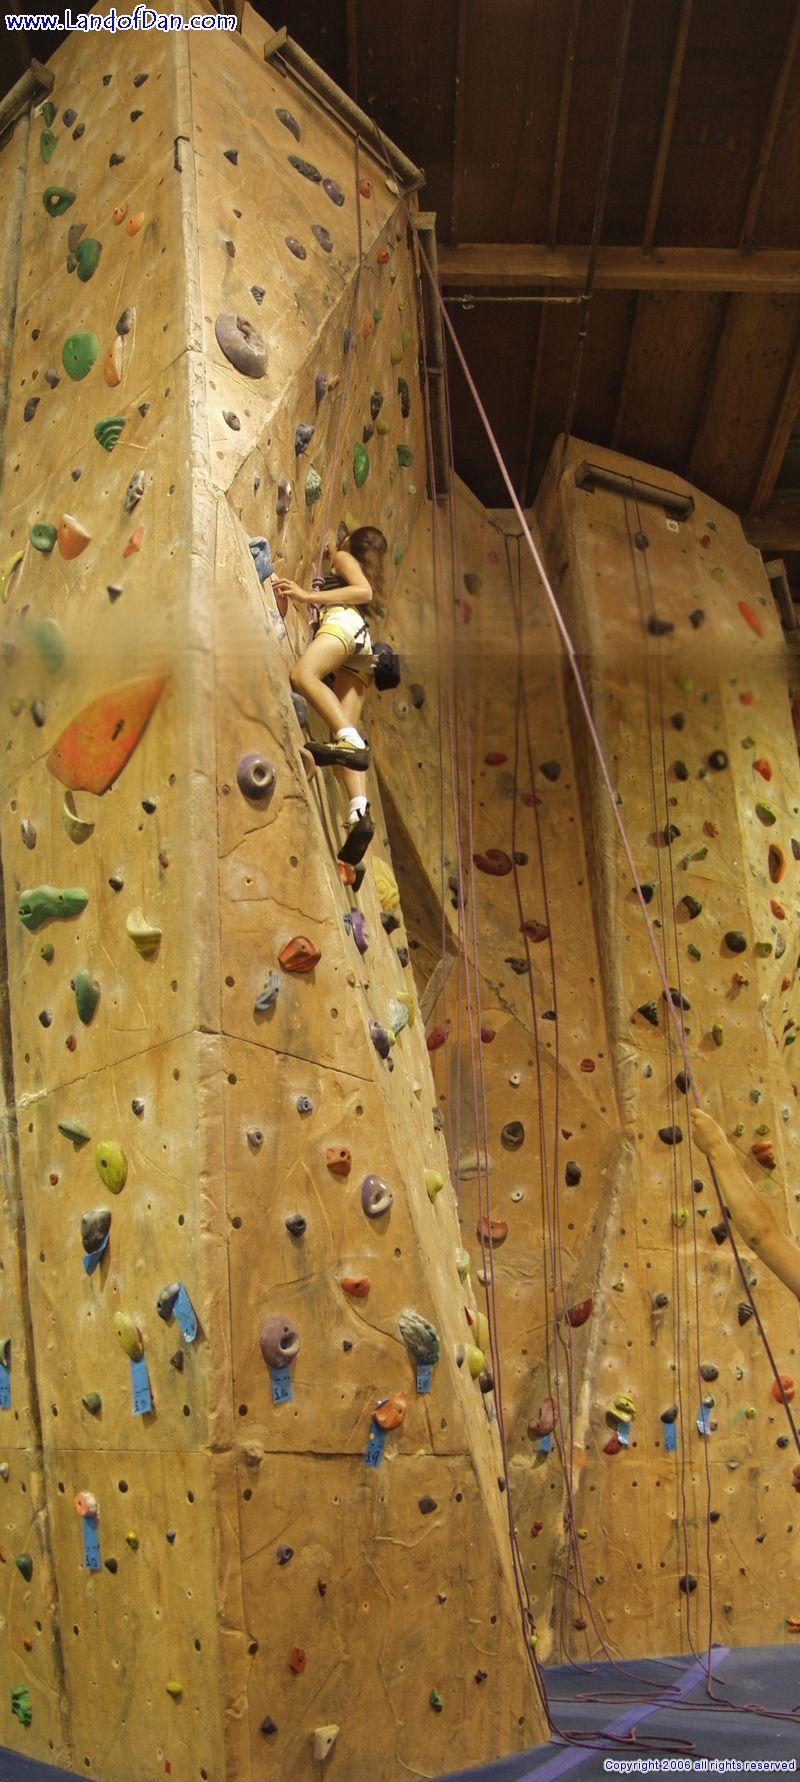 Indoor Rock Climbing | Climb! Climb! Climb! | Pinterest | Rock, Rock ...